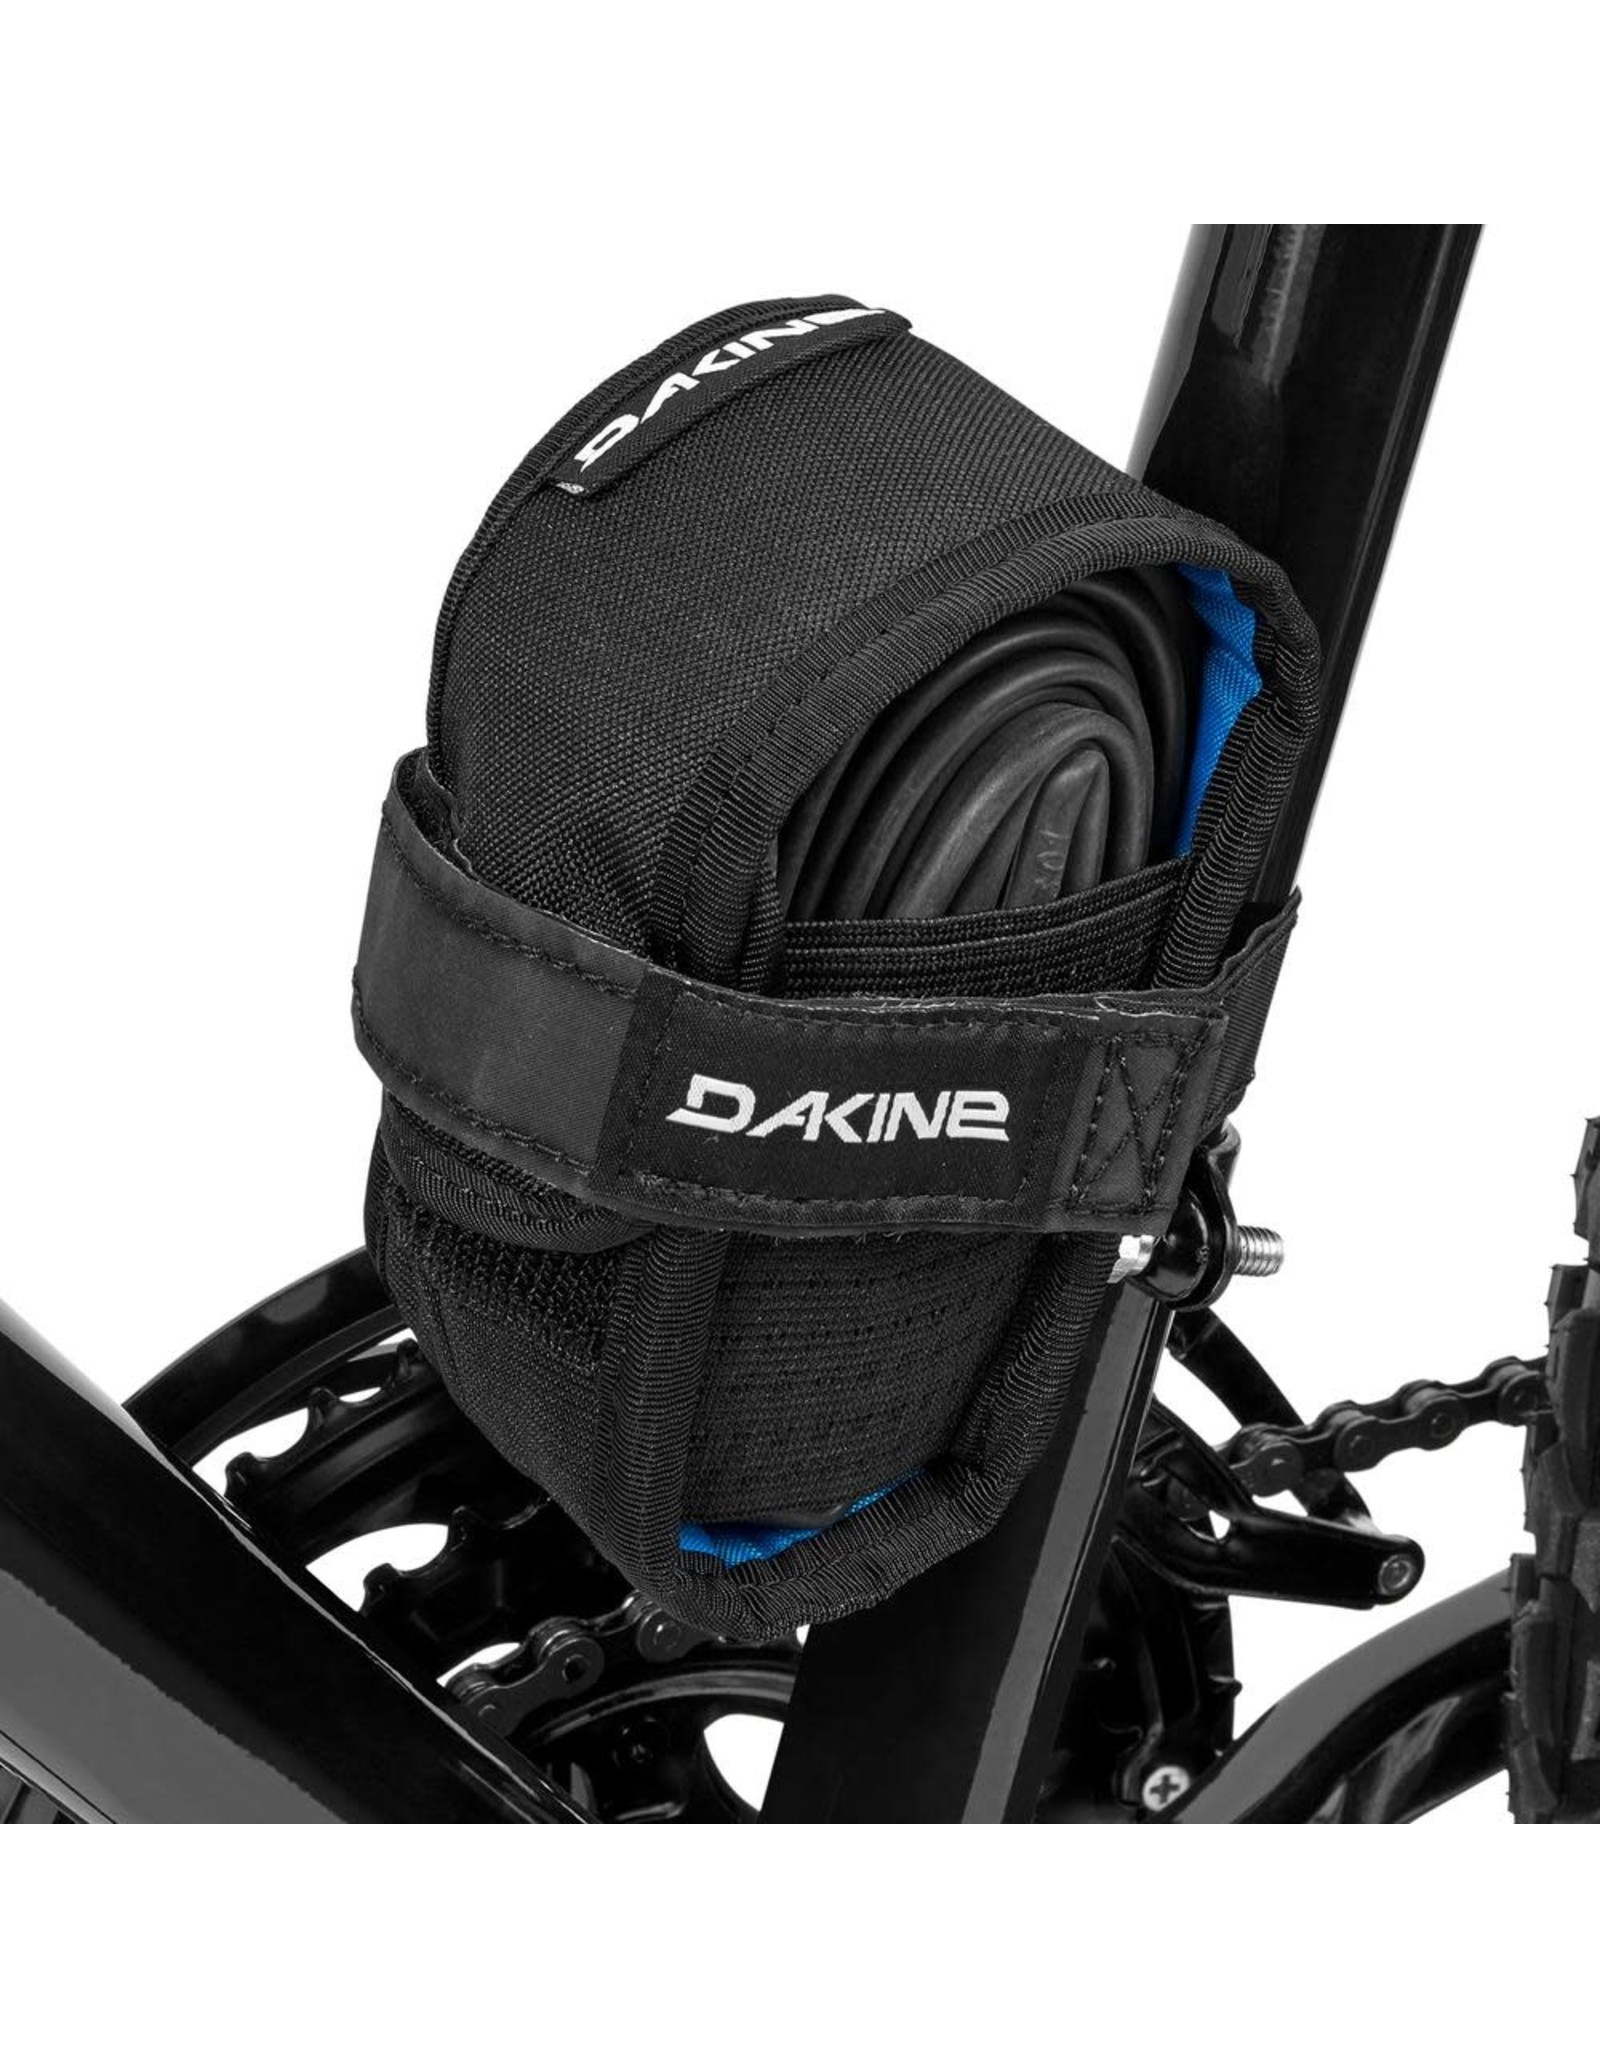 DAKINE HOT LAPS GRIPPER BLACK OS